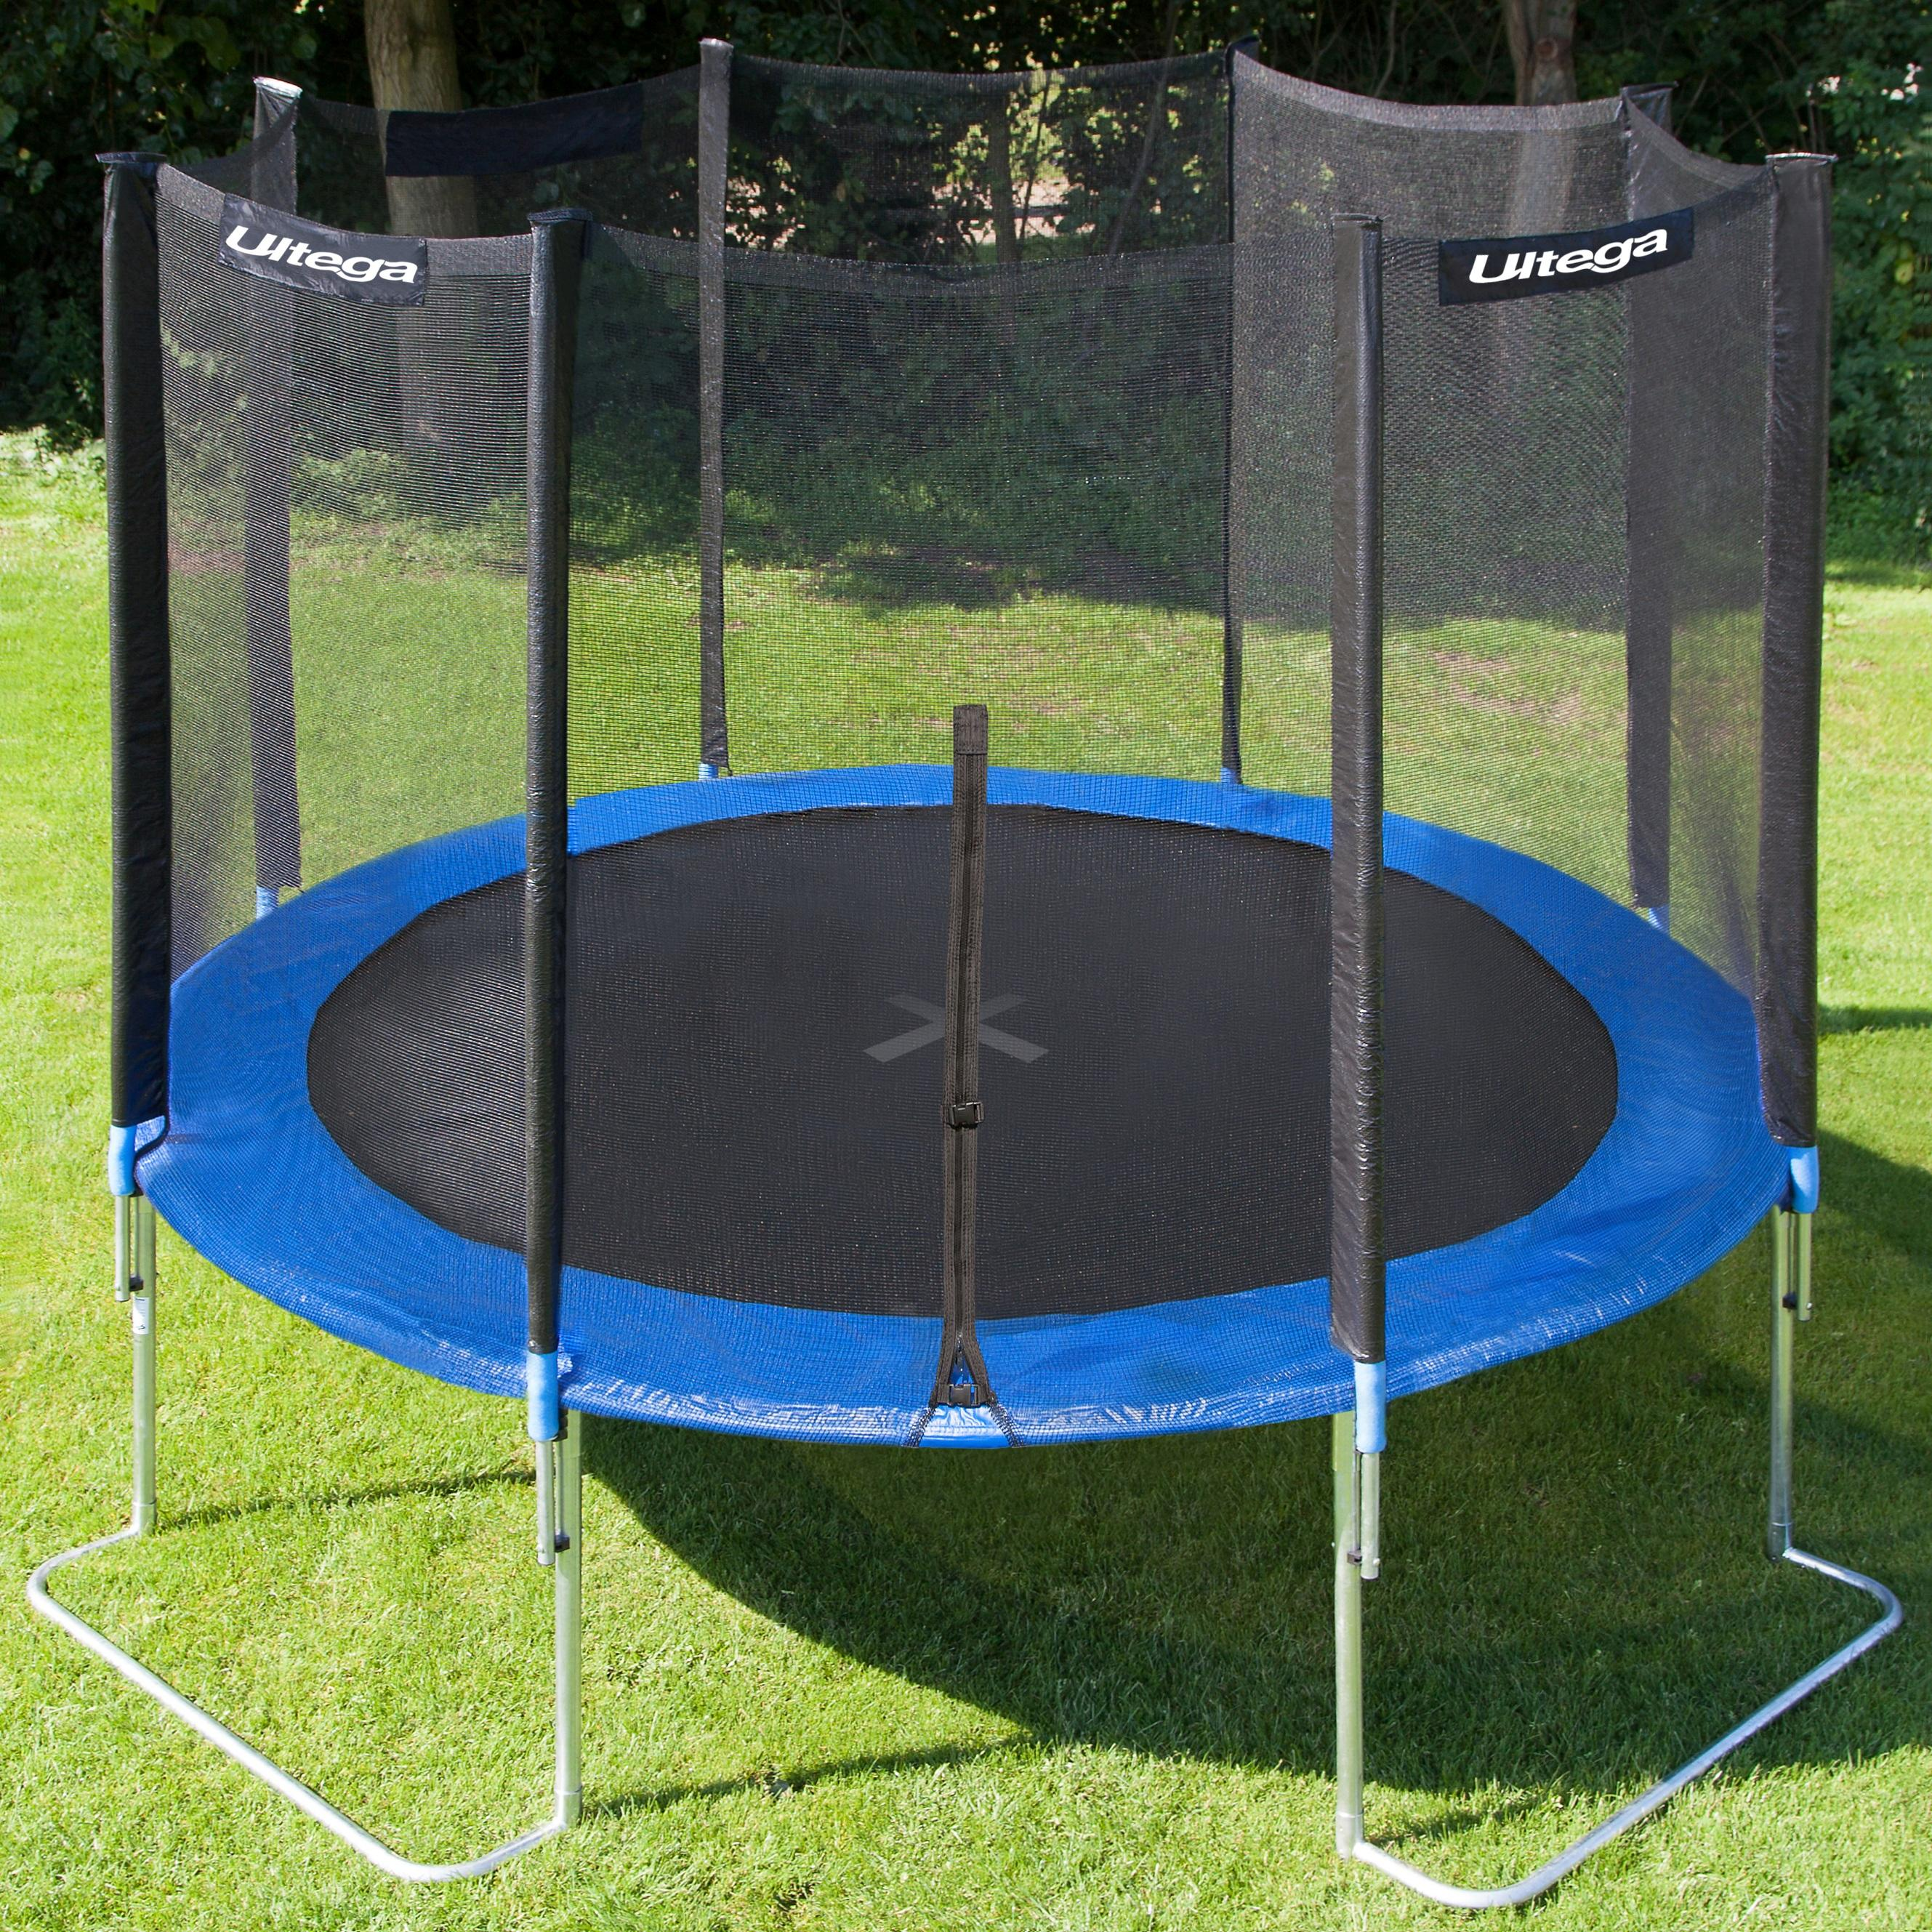 Amazon.com : Ultega Jumper Trampoline With Safety Net, 10